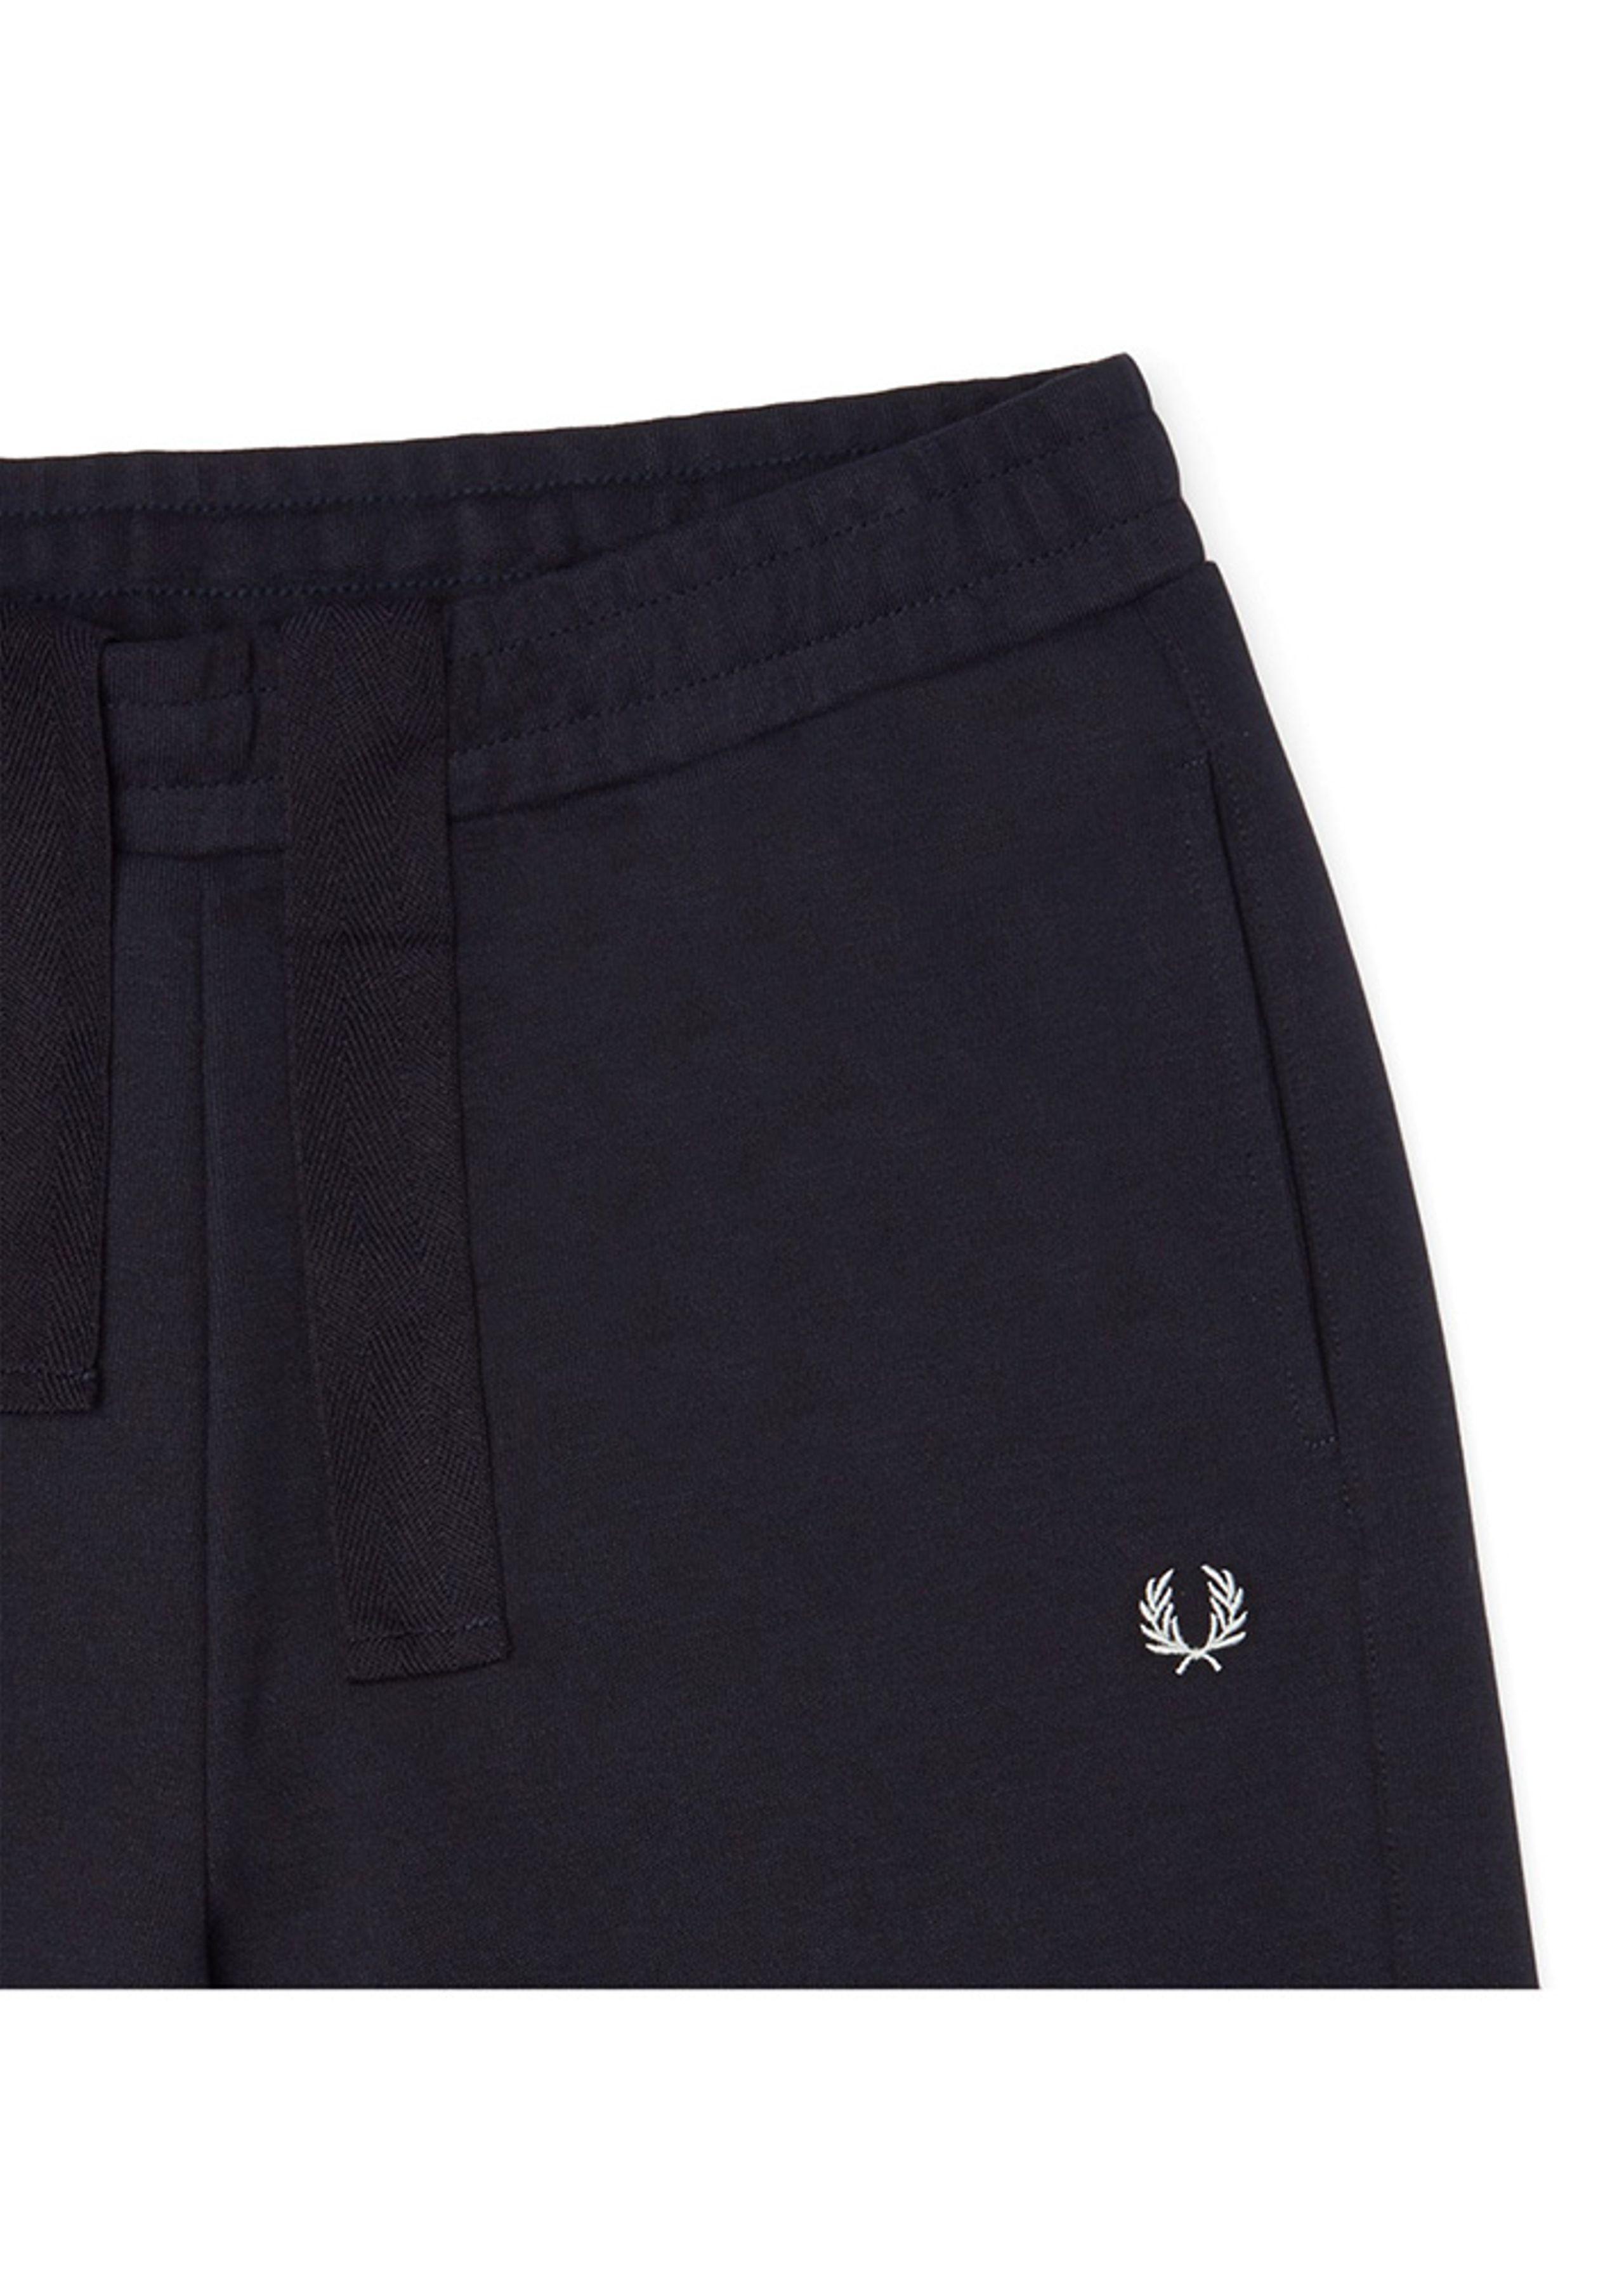 Track Pants | Bukser | Fred Perry bukser